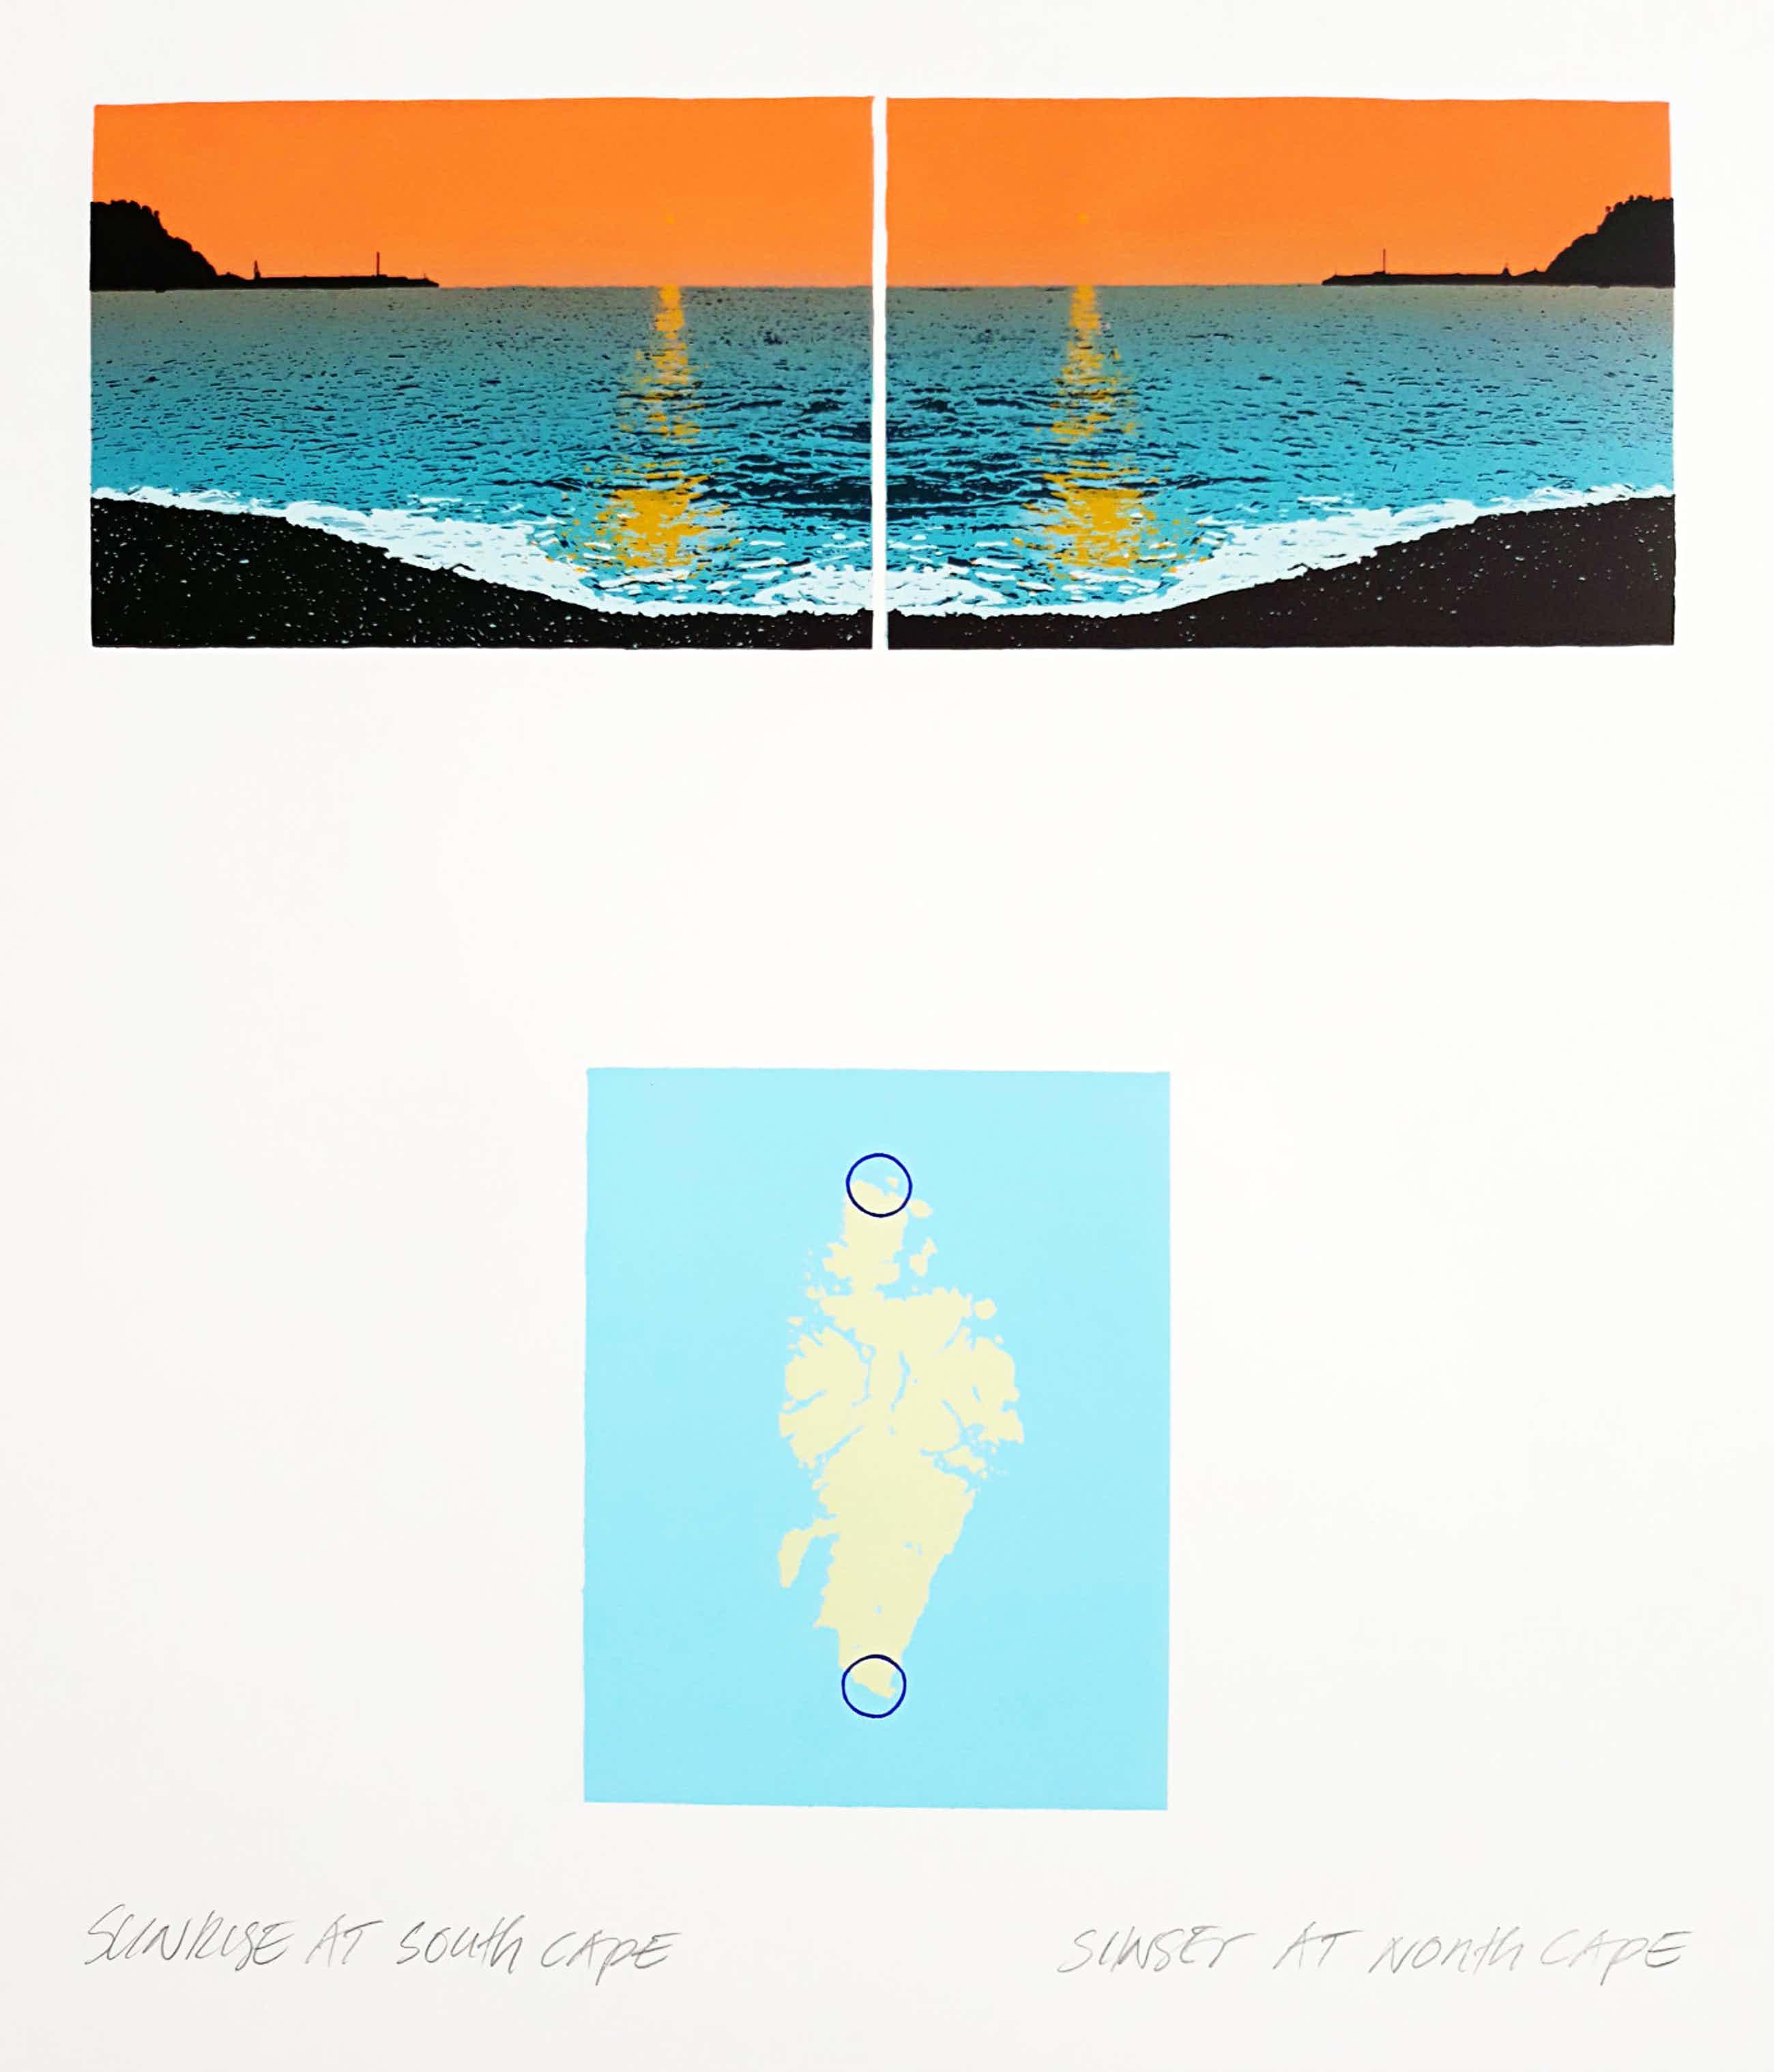 Jan Hendrix - Sunrise at South Cape / Sunset at North Cape, zeefdruk kopen? Bied vanaf 40!